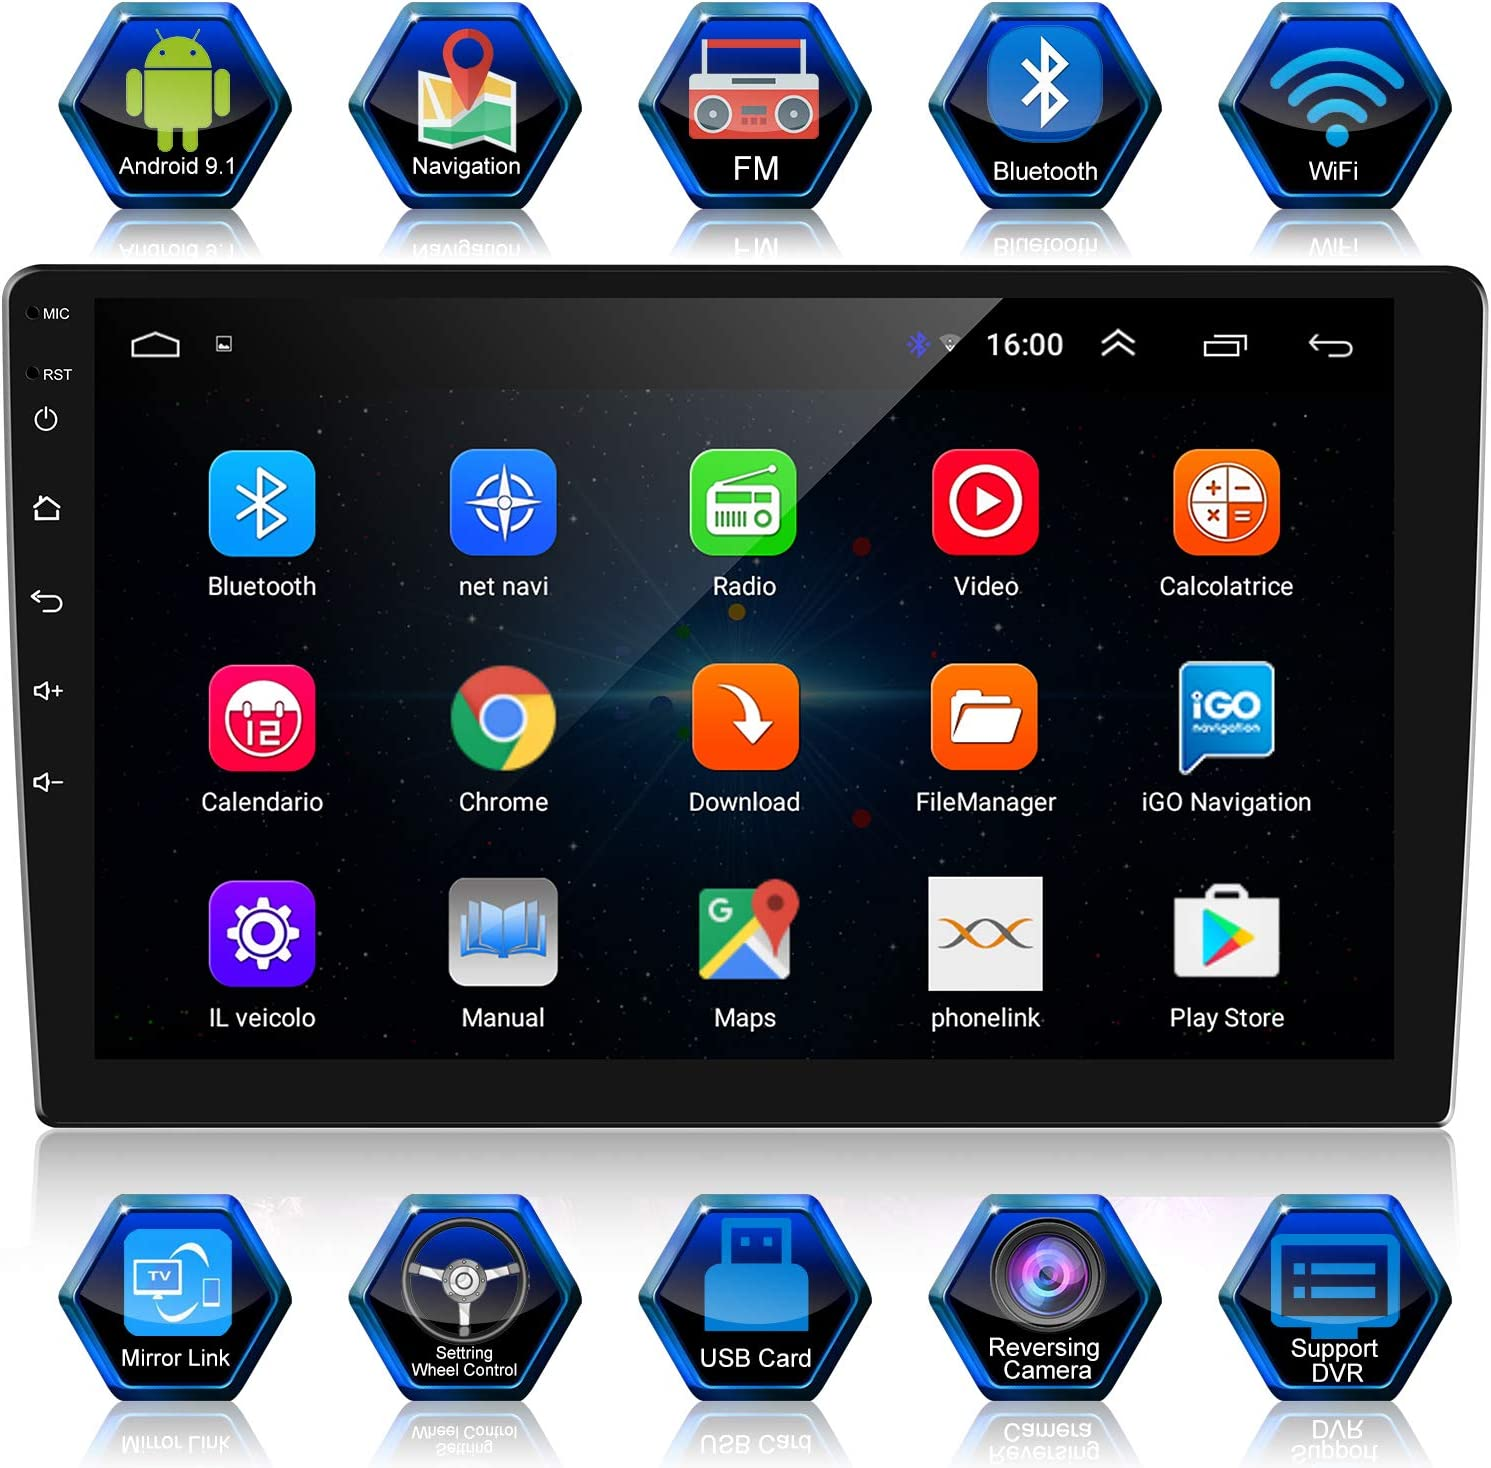 ANKEWAY 2 DIN 10.1 Pulgadas Android 9.1 Radio de Coche Navegación GPS 1080P HD Pantalla Táctil WiFi/Bluetooth Manos Libres Autoradio 1G/16G Multimedia Car Stereo+Internet WiFi+Cámara de Visión Trasera: Amazon.es: Electrónica